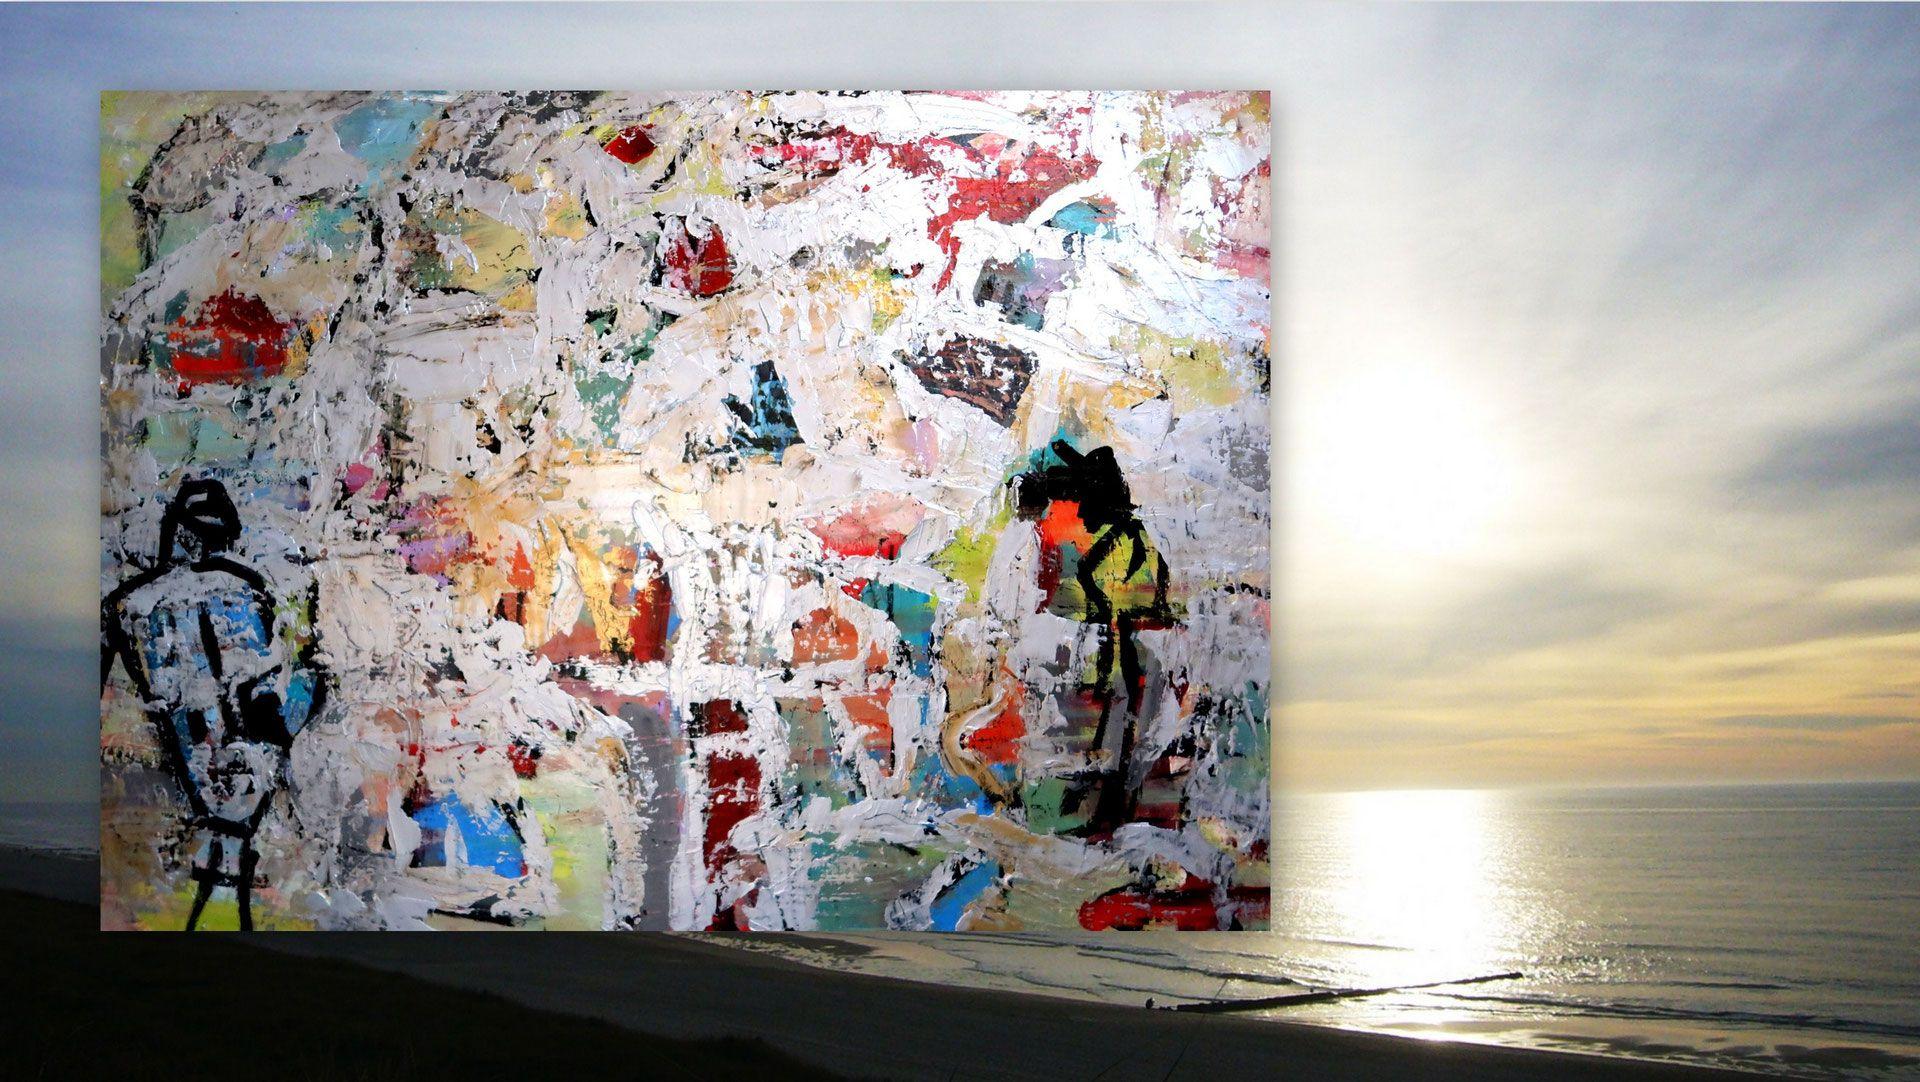 moderne bilder modern abstrakt malerei in acryl gemalde abstrakte bilde kunst malen